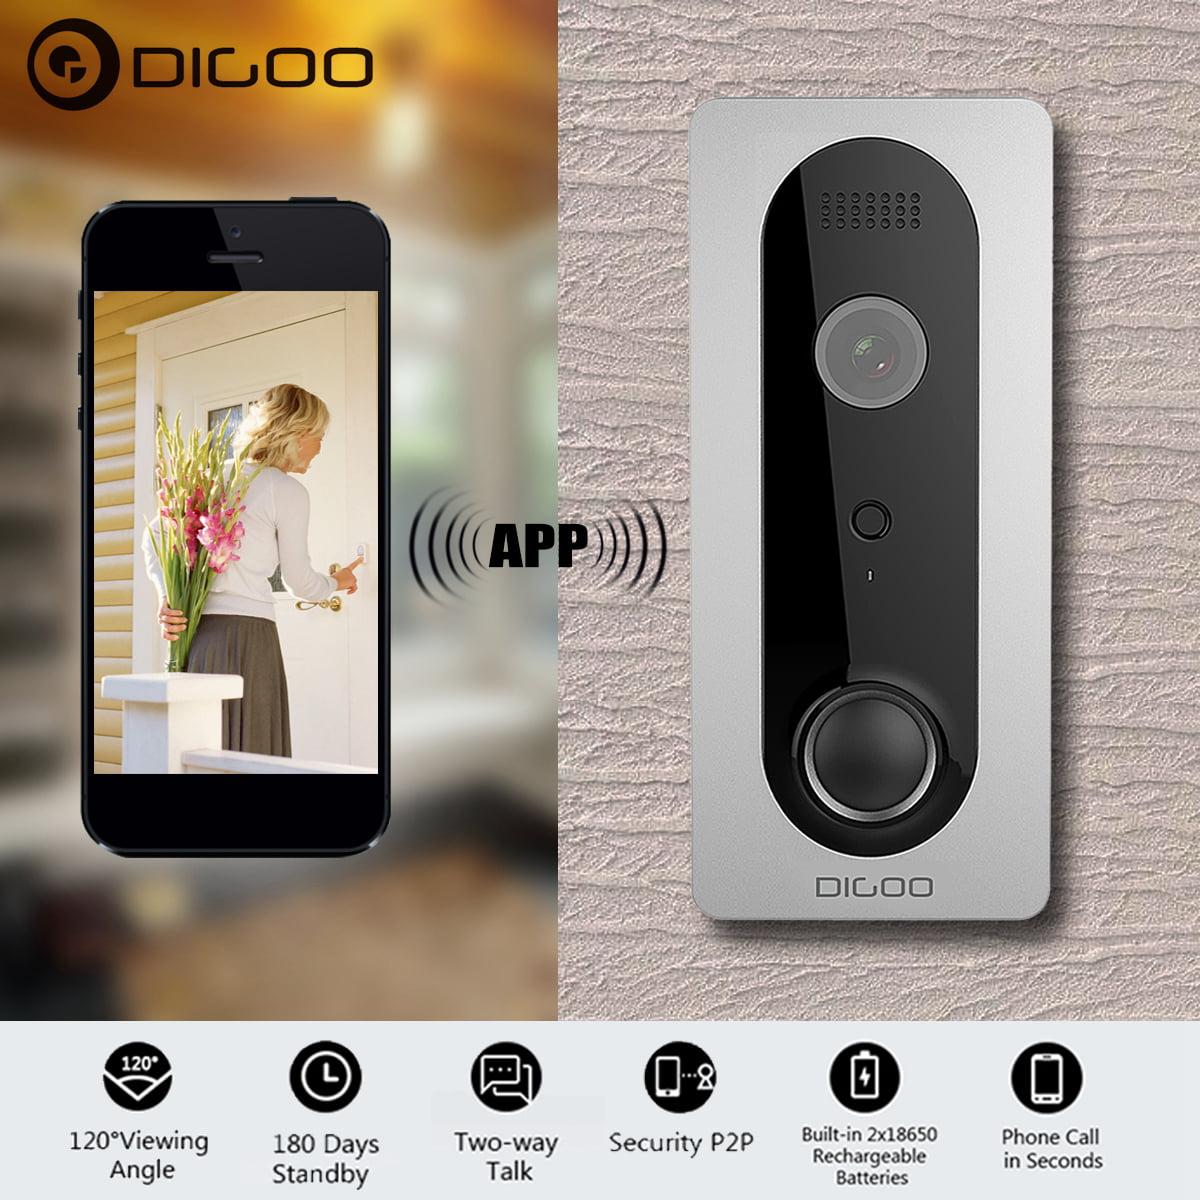 DIGOO 1080P WIFI Wireless Ring DoorBell with Camera Smart Home Night Visual Video Security Camera Phone App Control Intercom Alarm Clear Night Vision Doorbell